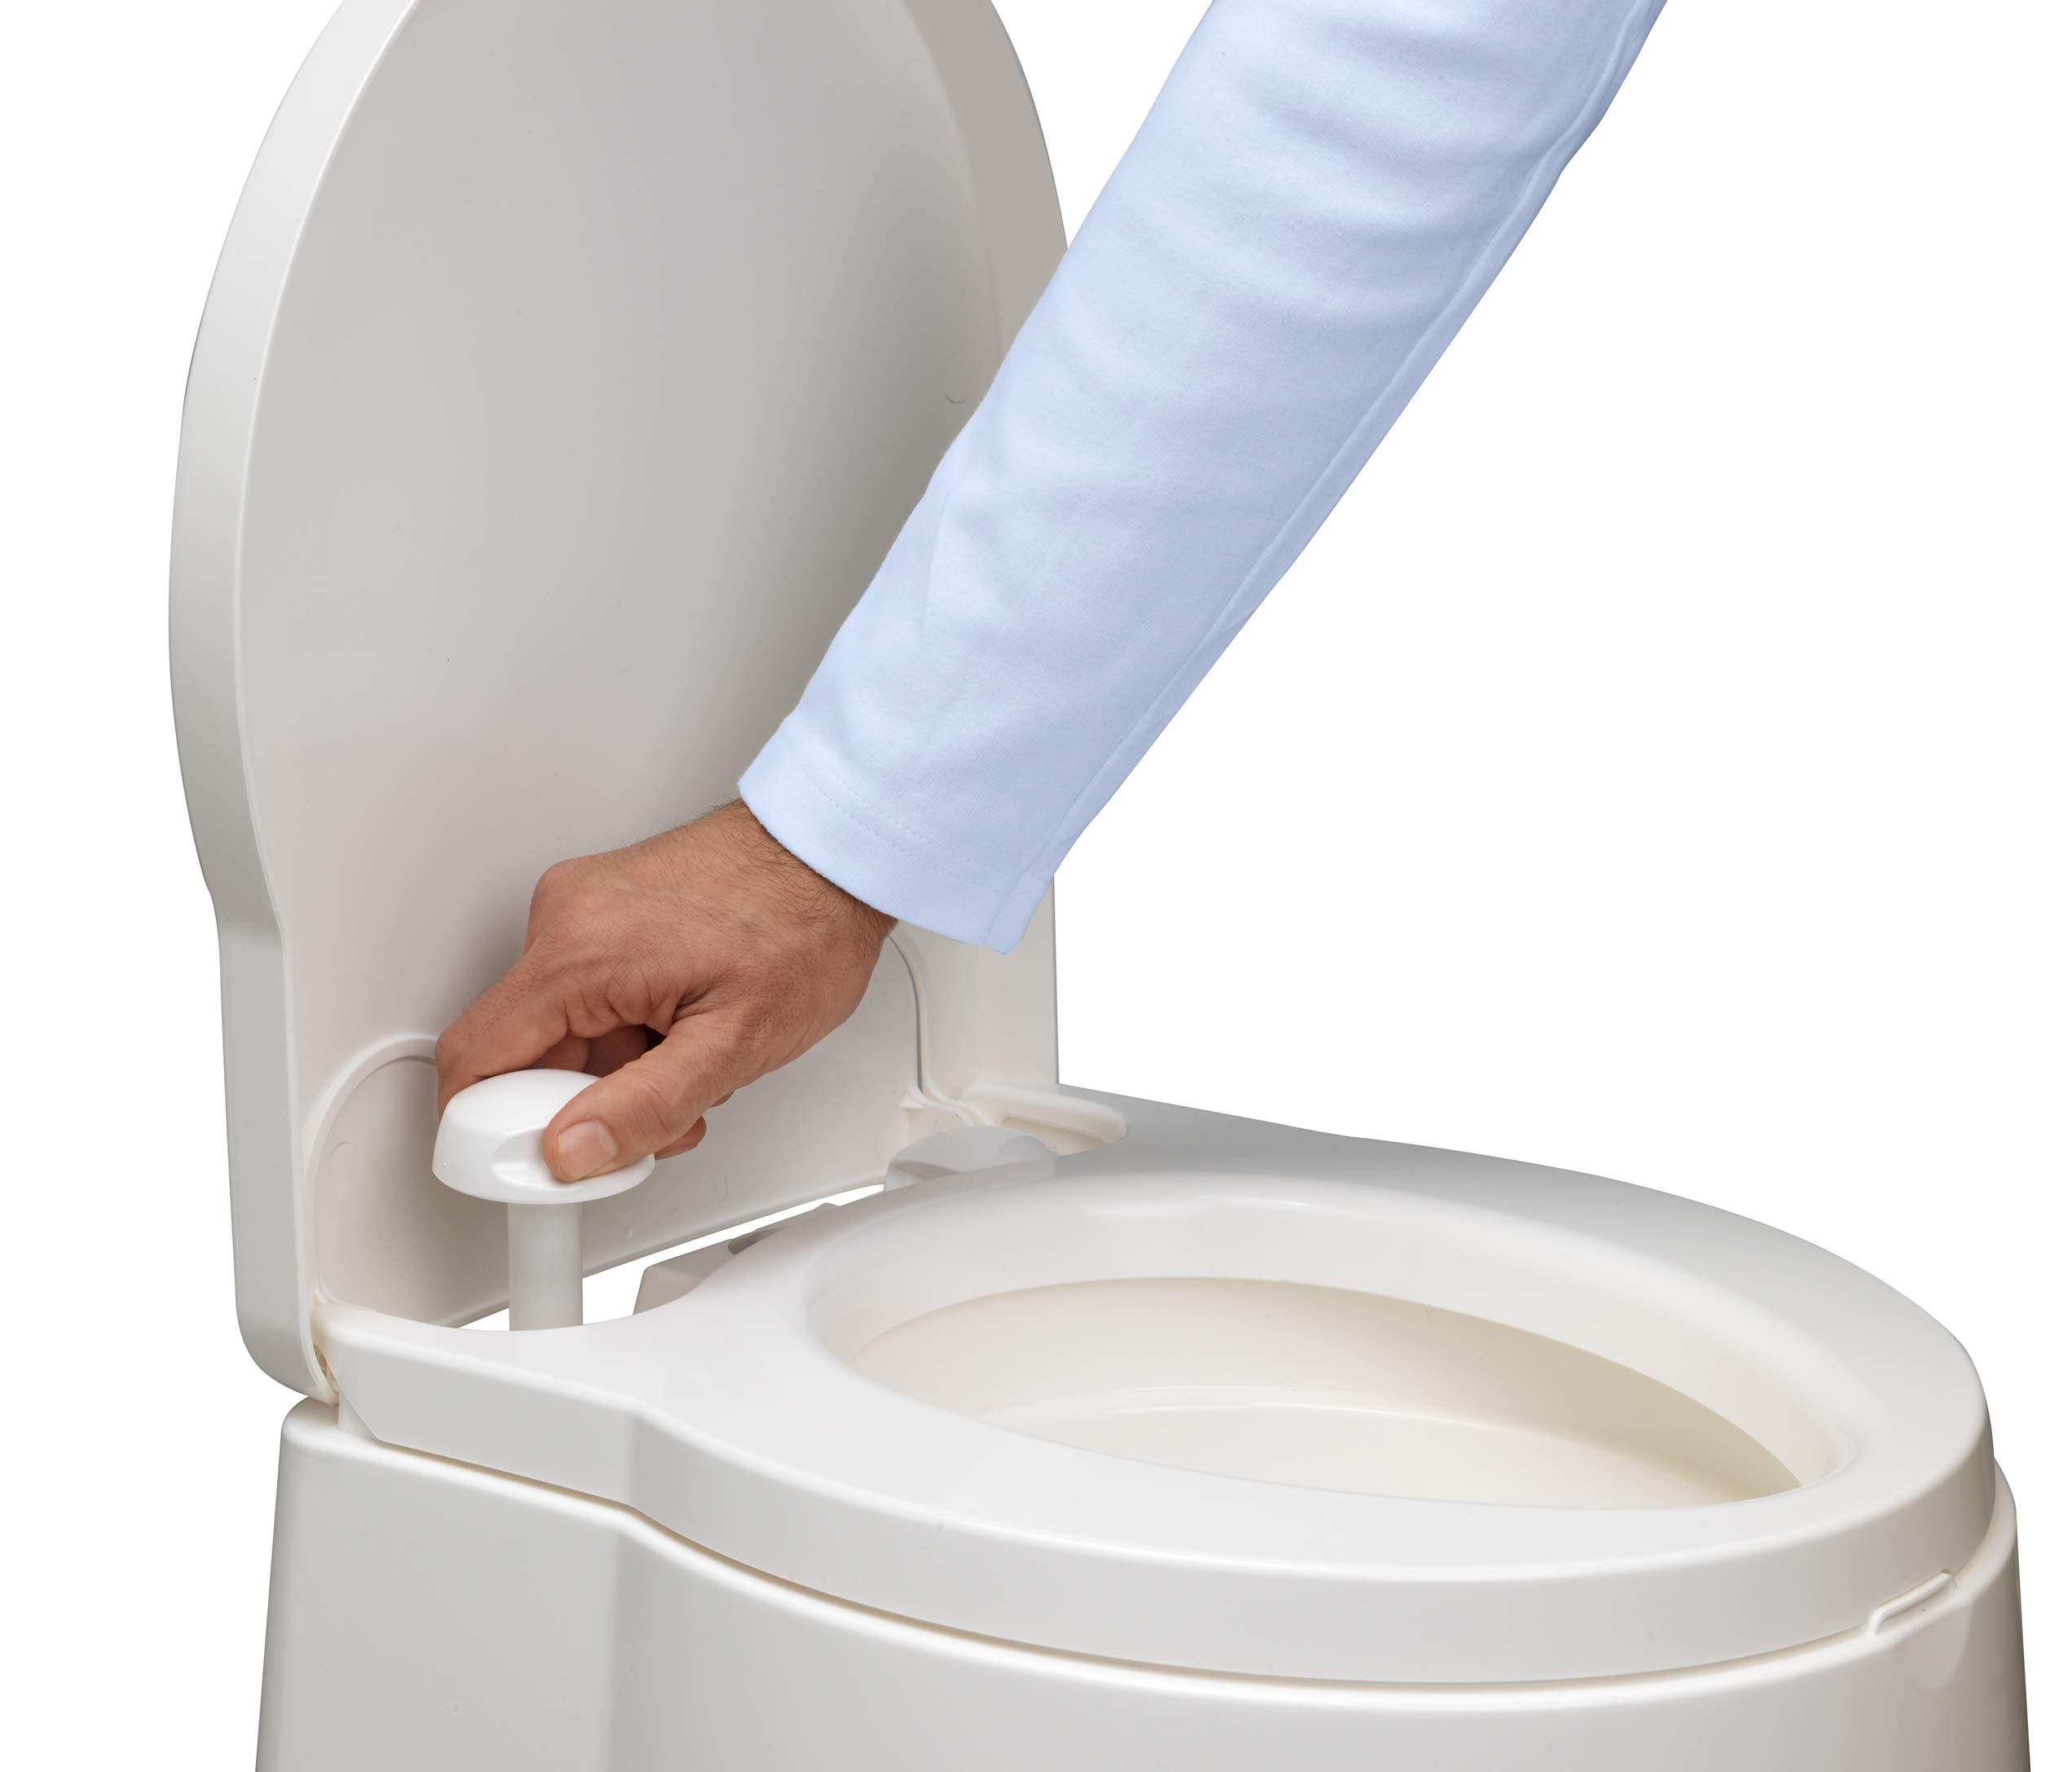 Thetford 92305 Porta Potti 565P Excellence Portable Toilet (Manual), 448 x 388 x 450 mm 18